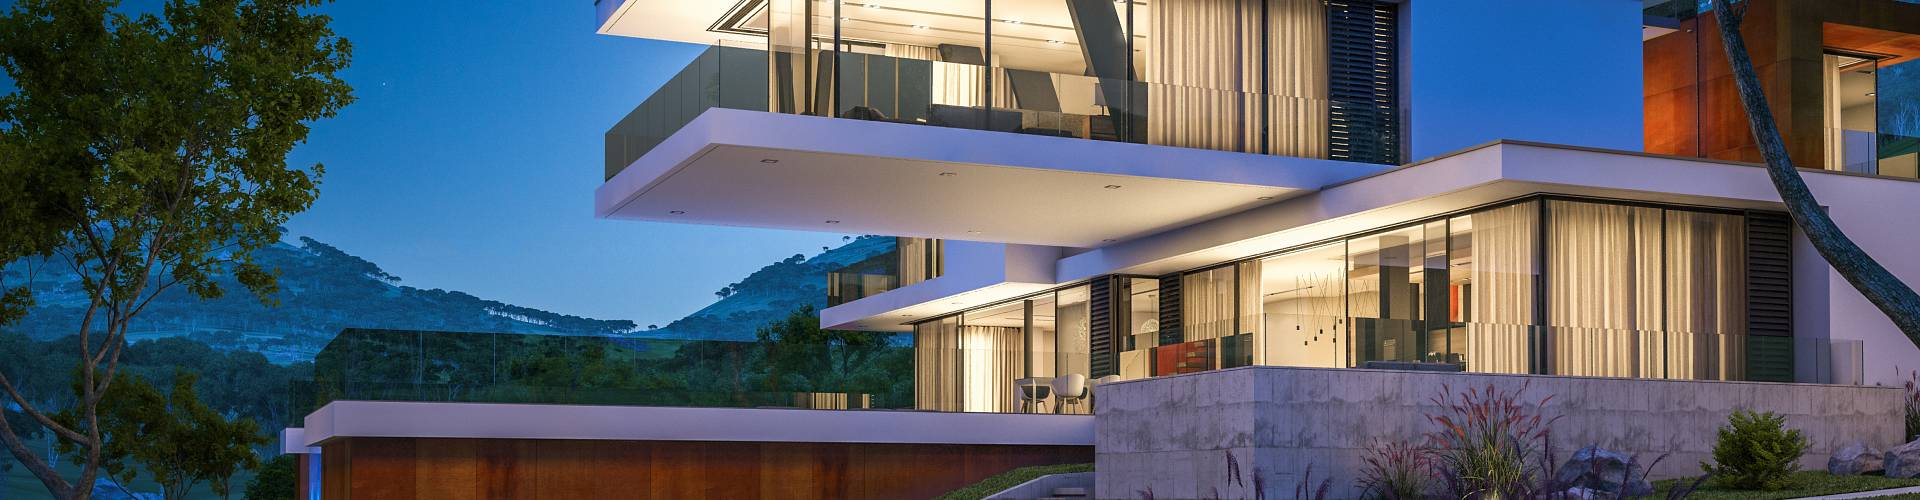 Immobilien - RE/MAX Immobilier Lausanne